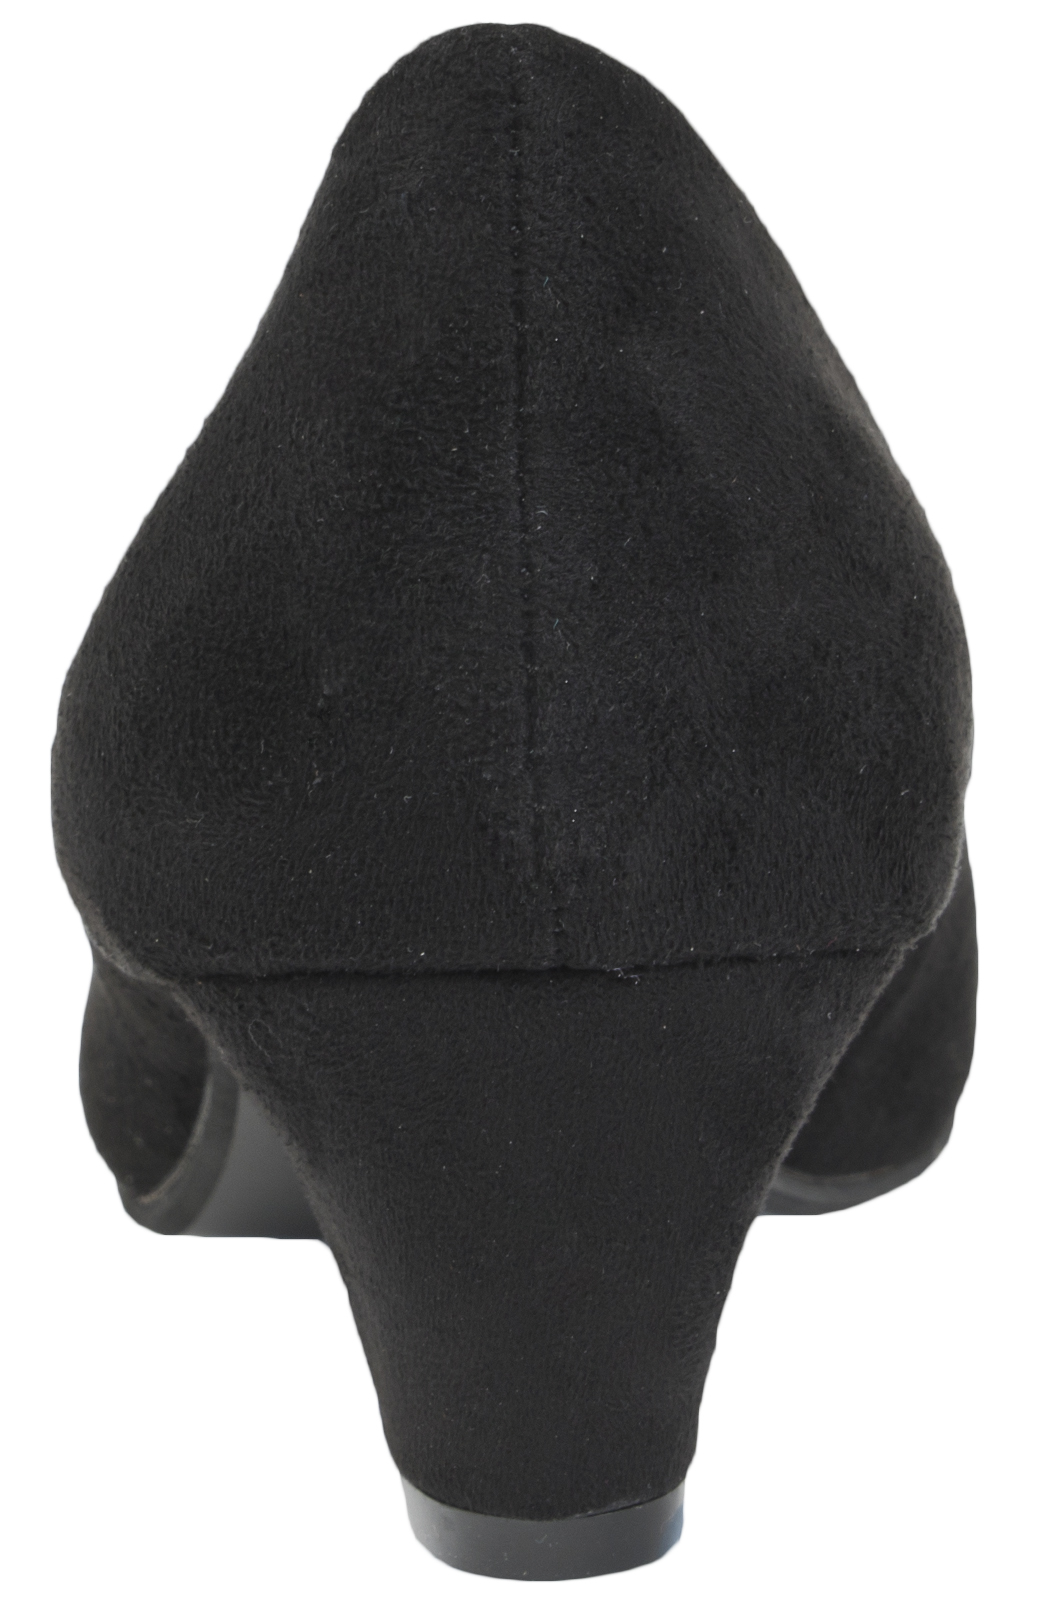 Ladies-Leather-Lined-Low-Block-Heels-Comfort-Work-Office-Court-Shoes-Ladies-Size miniatuur 8